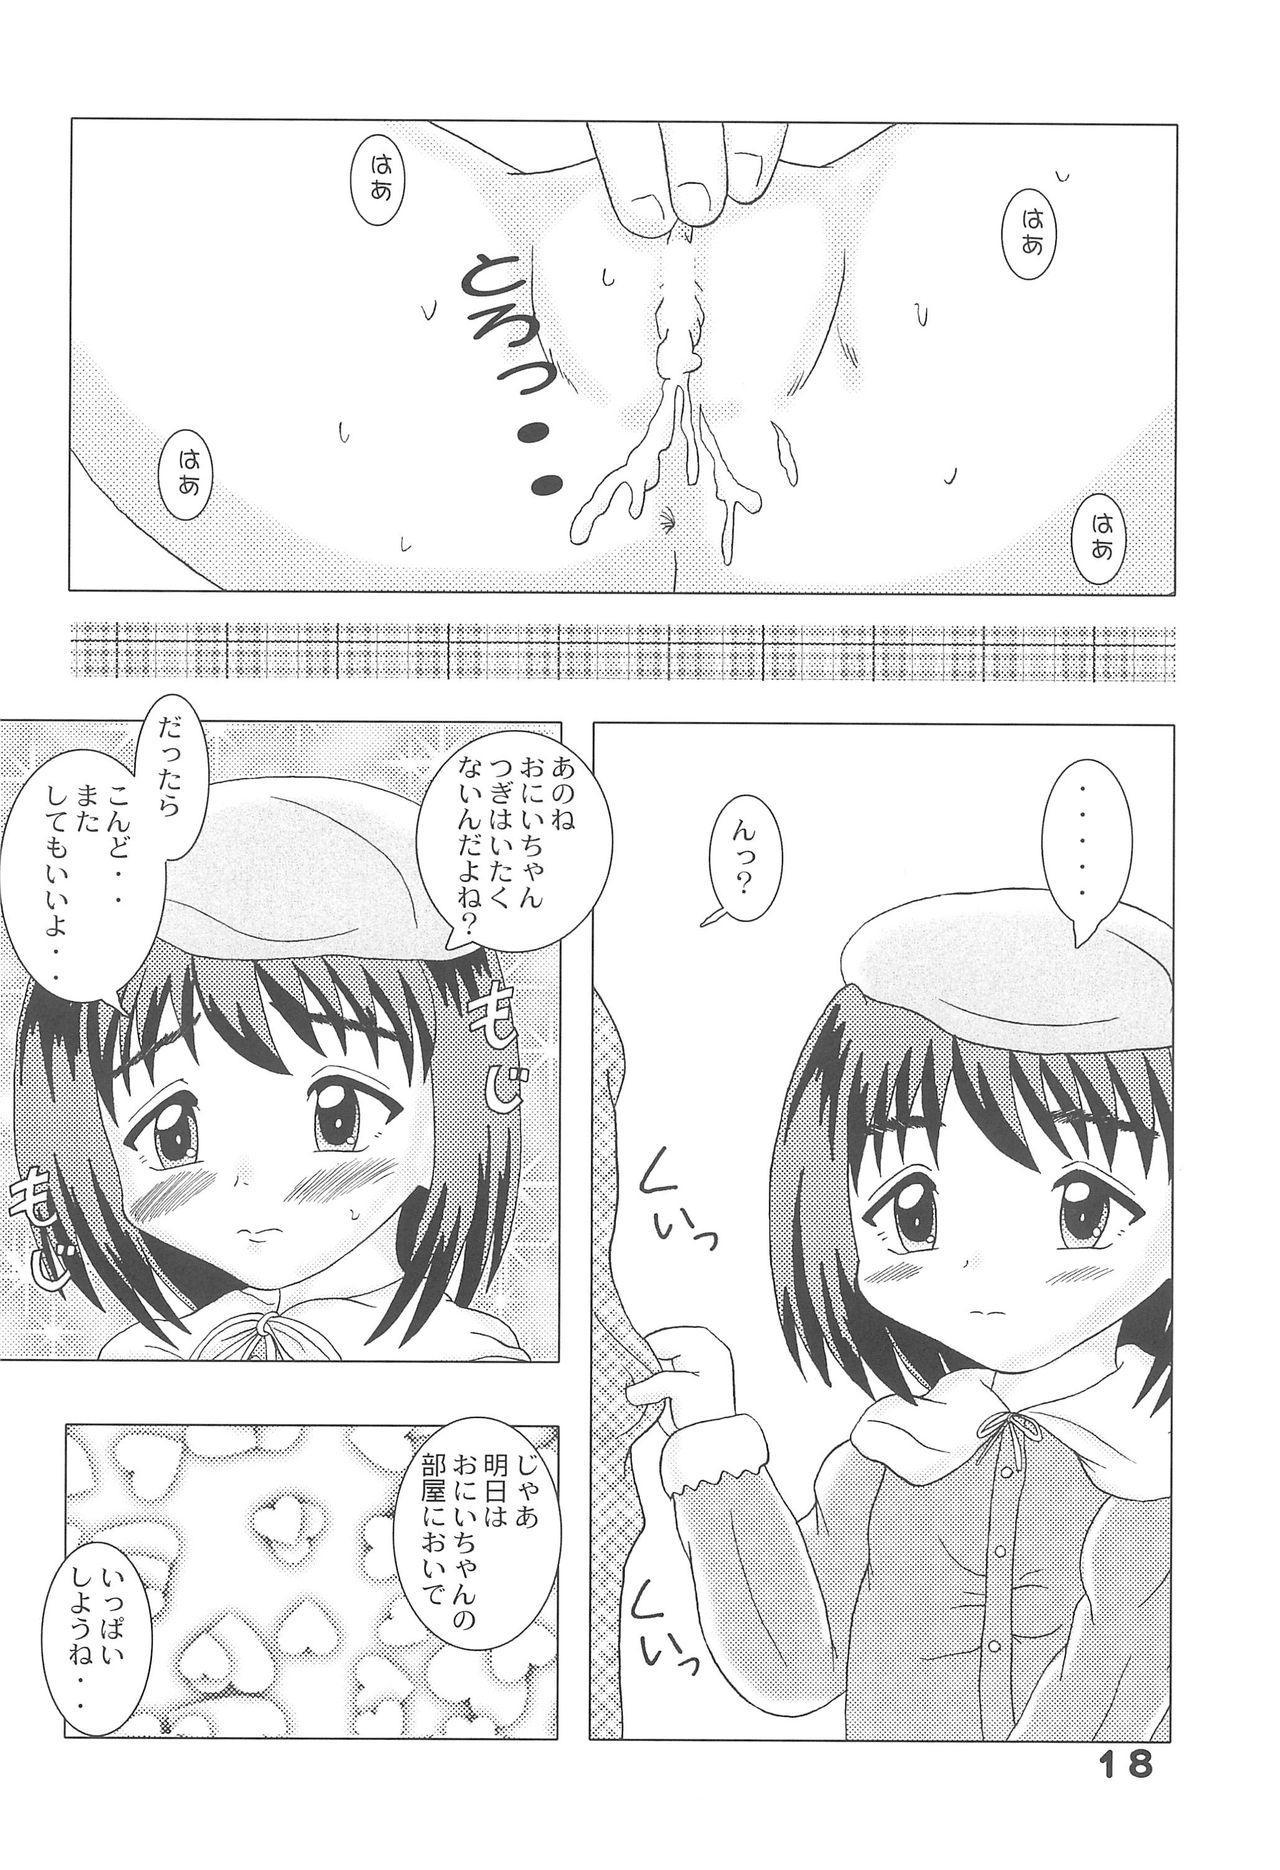 Itazura Tenshi 17